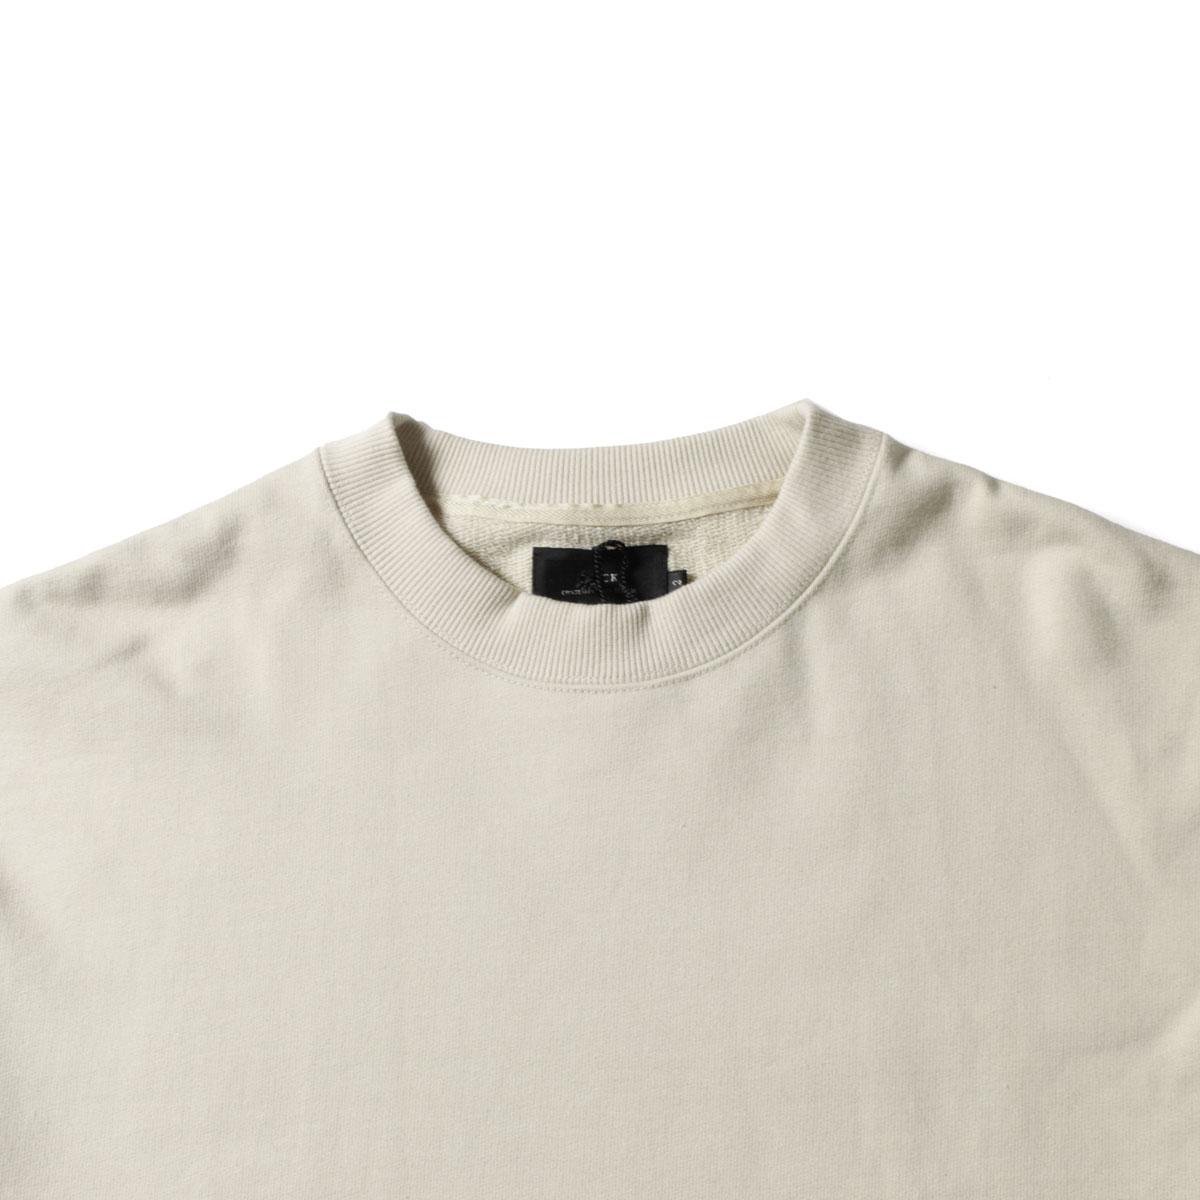 Regatta Unisex Kids Wendell Cotton Graphic Print Long Sleeve T-Shirt Long Sleeves T-Shirts//Polos//Vests